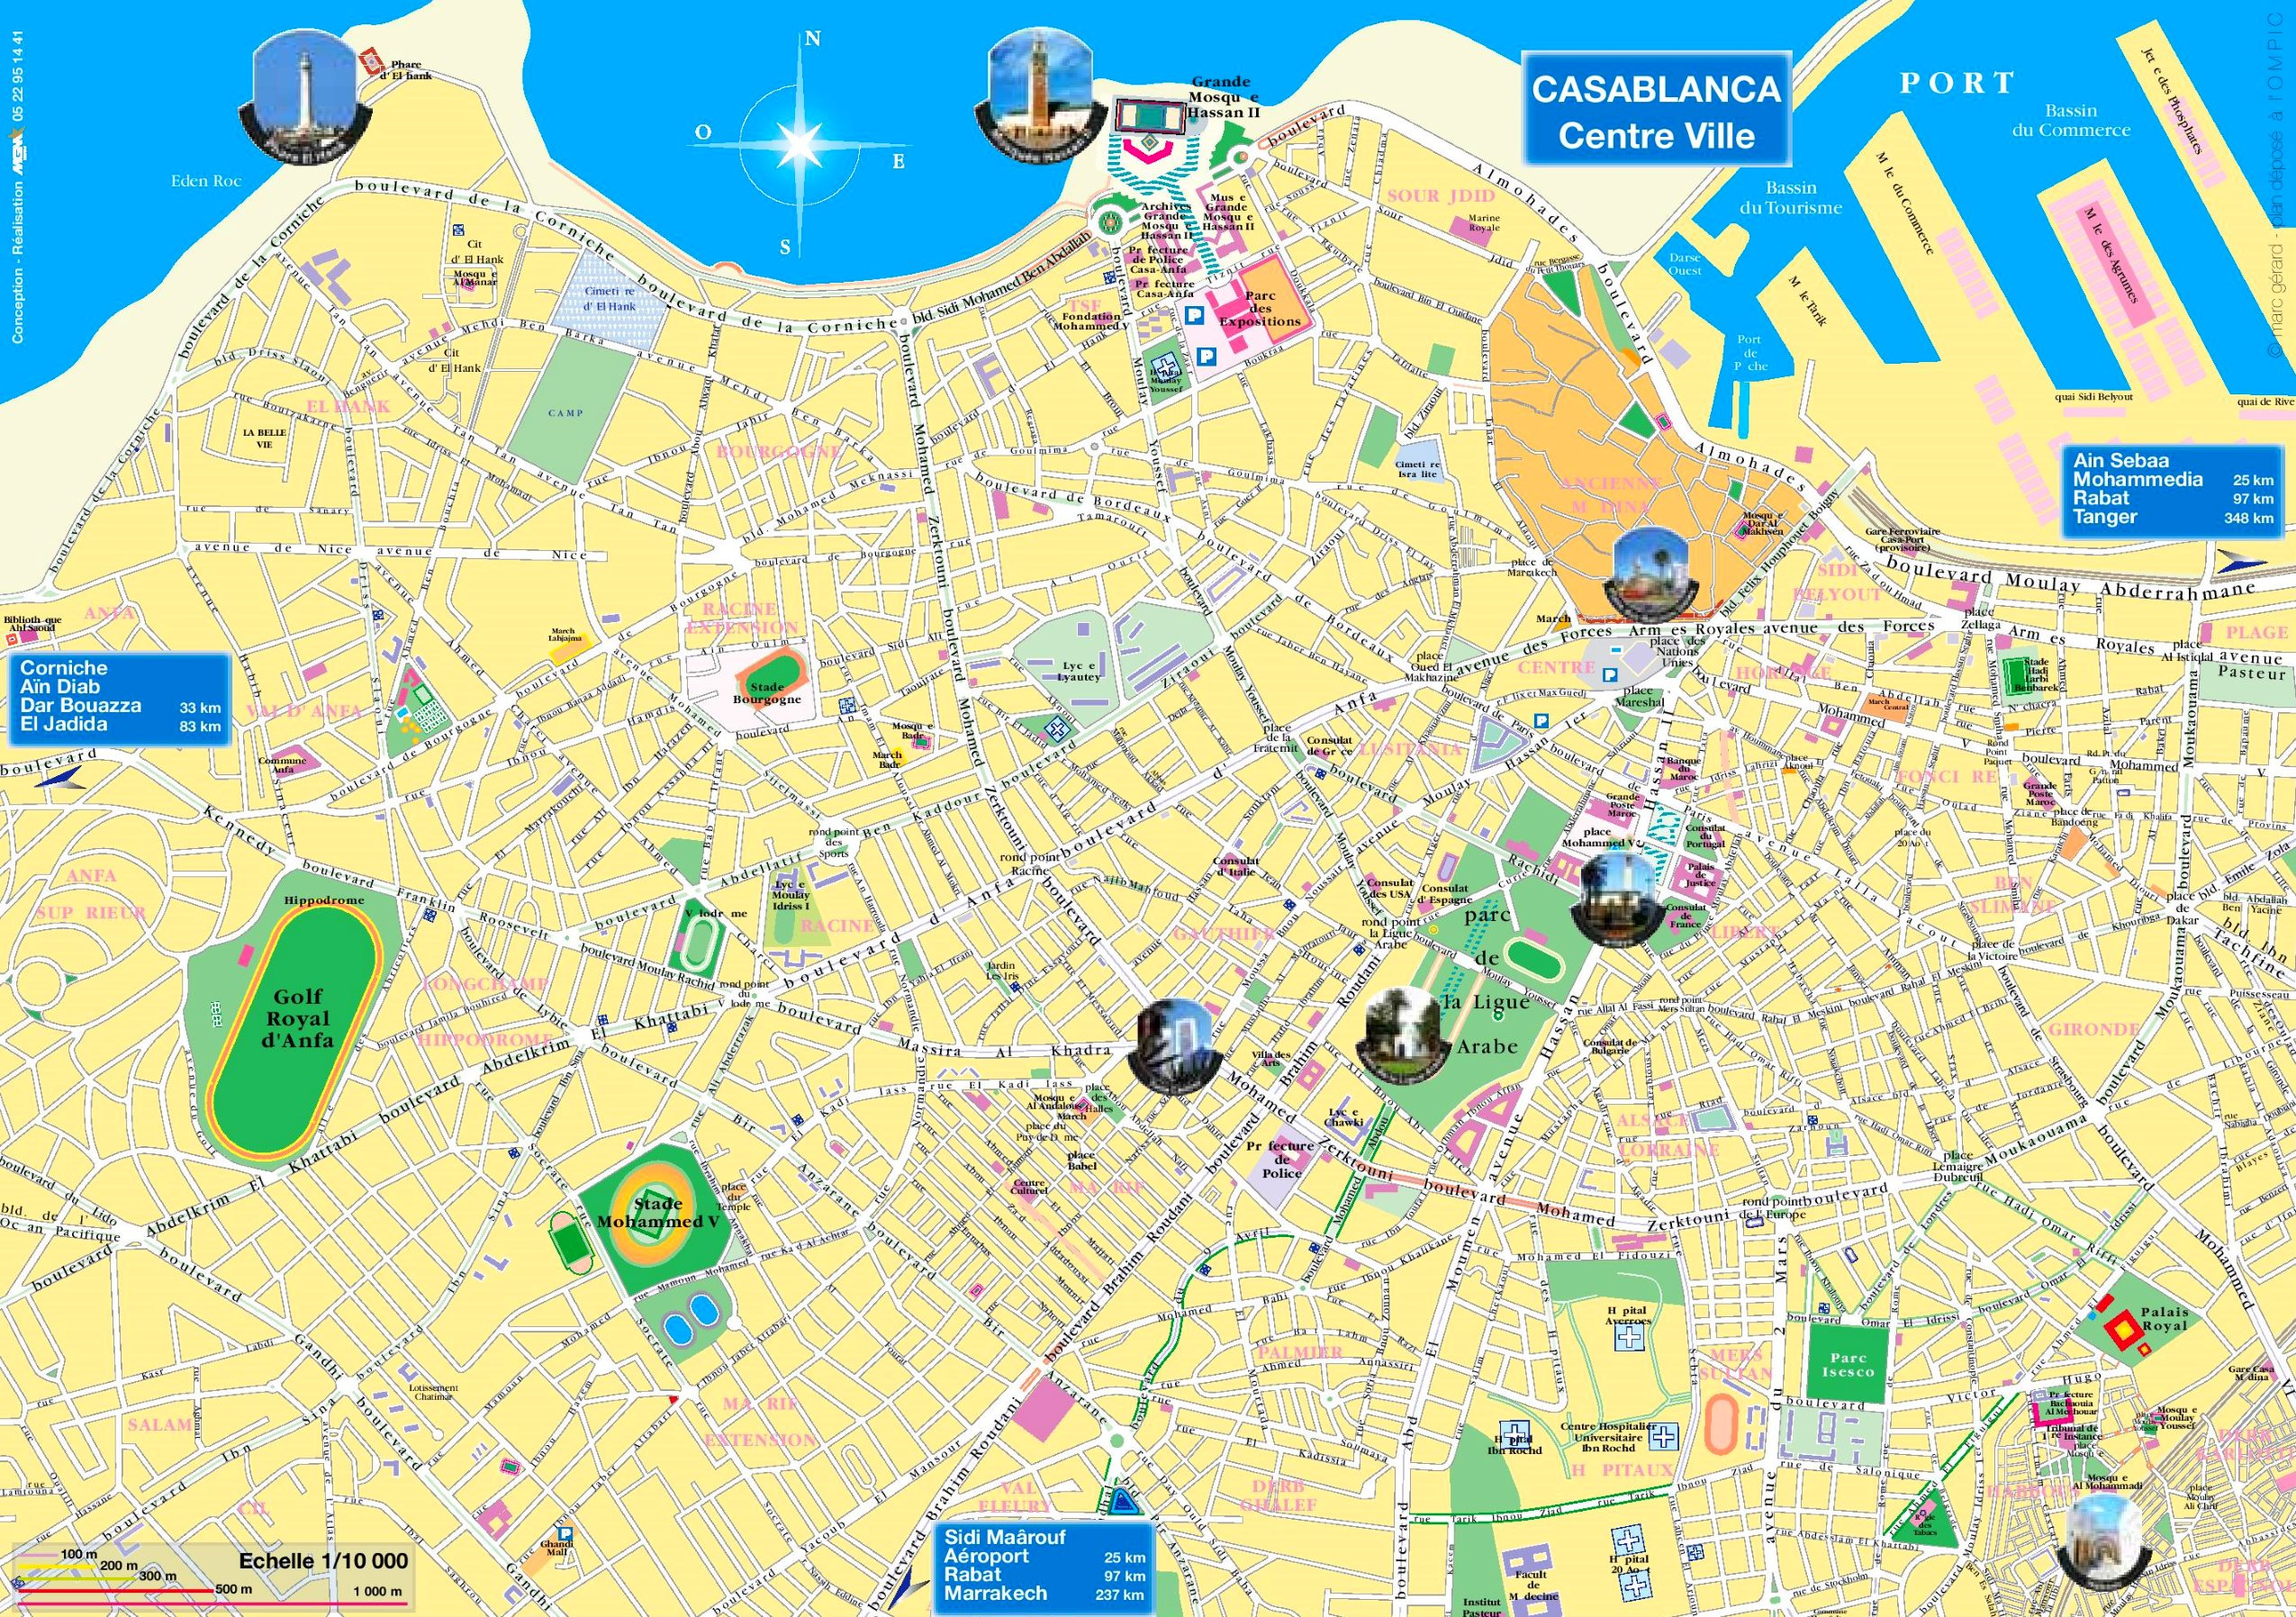 Casablanca tourist map on johannesburg map, key largo map, algeria map, timbuktu map, potsdam map, dubai map, morocco map, tripoli map, western sahara map, marrakesh map, marrakech map, africa map, algiers map, dar es salaam map, cape town map, damascus map, accra map, salerno map, oran map, lima map,